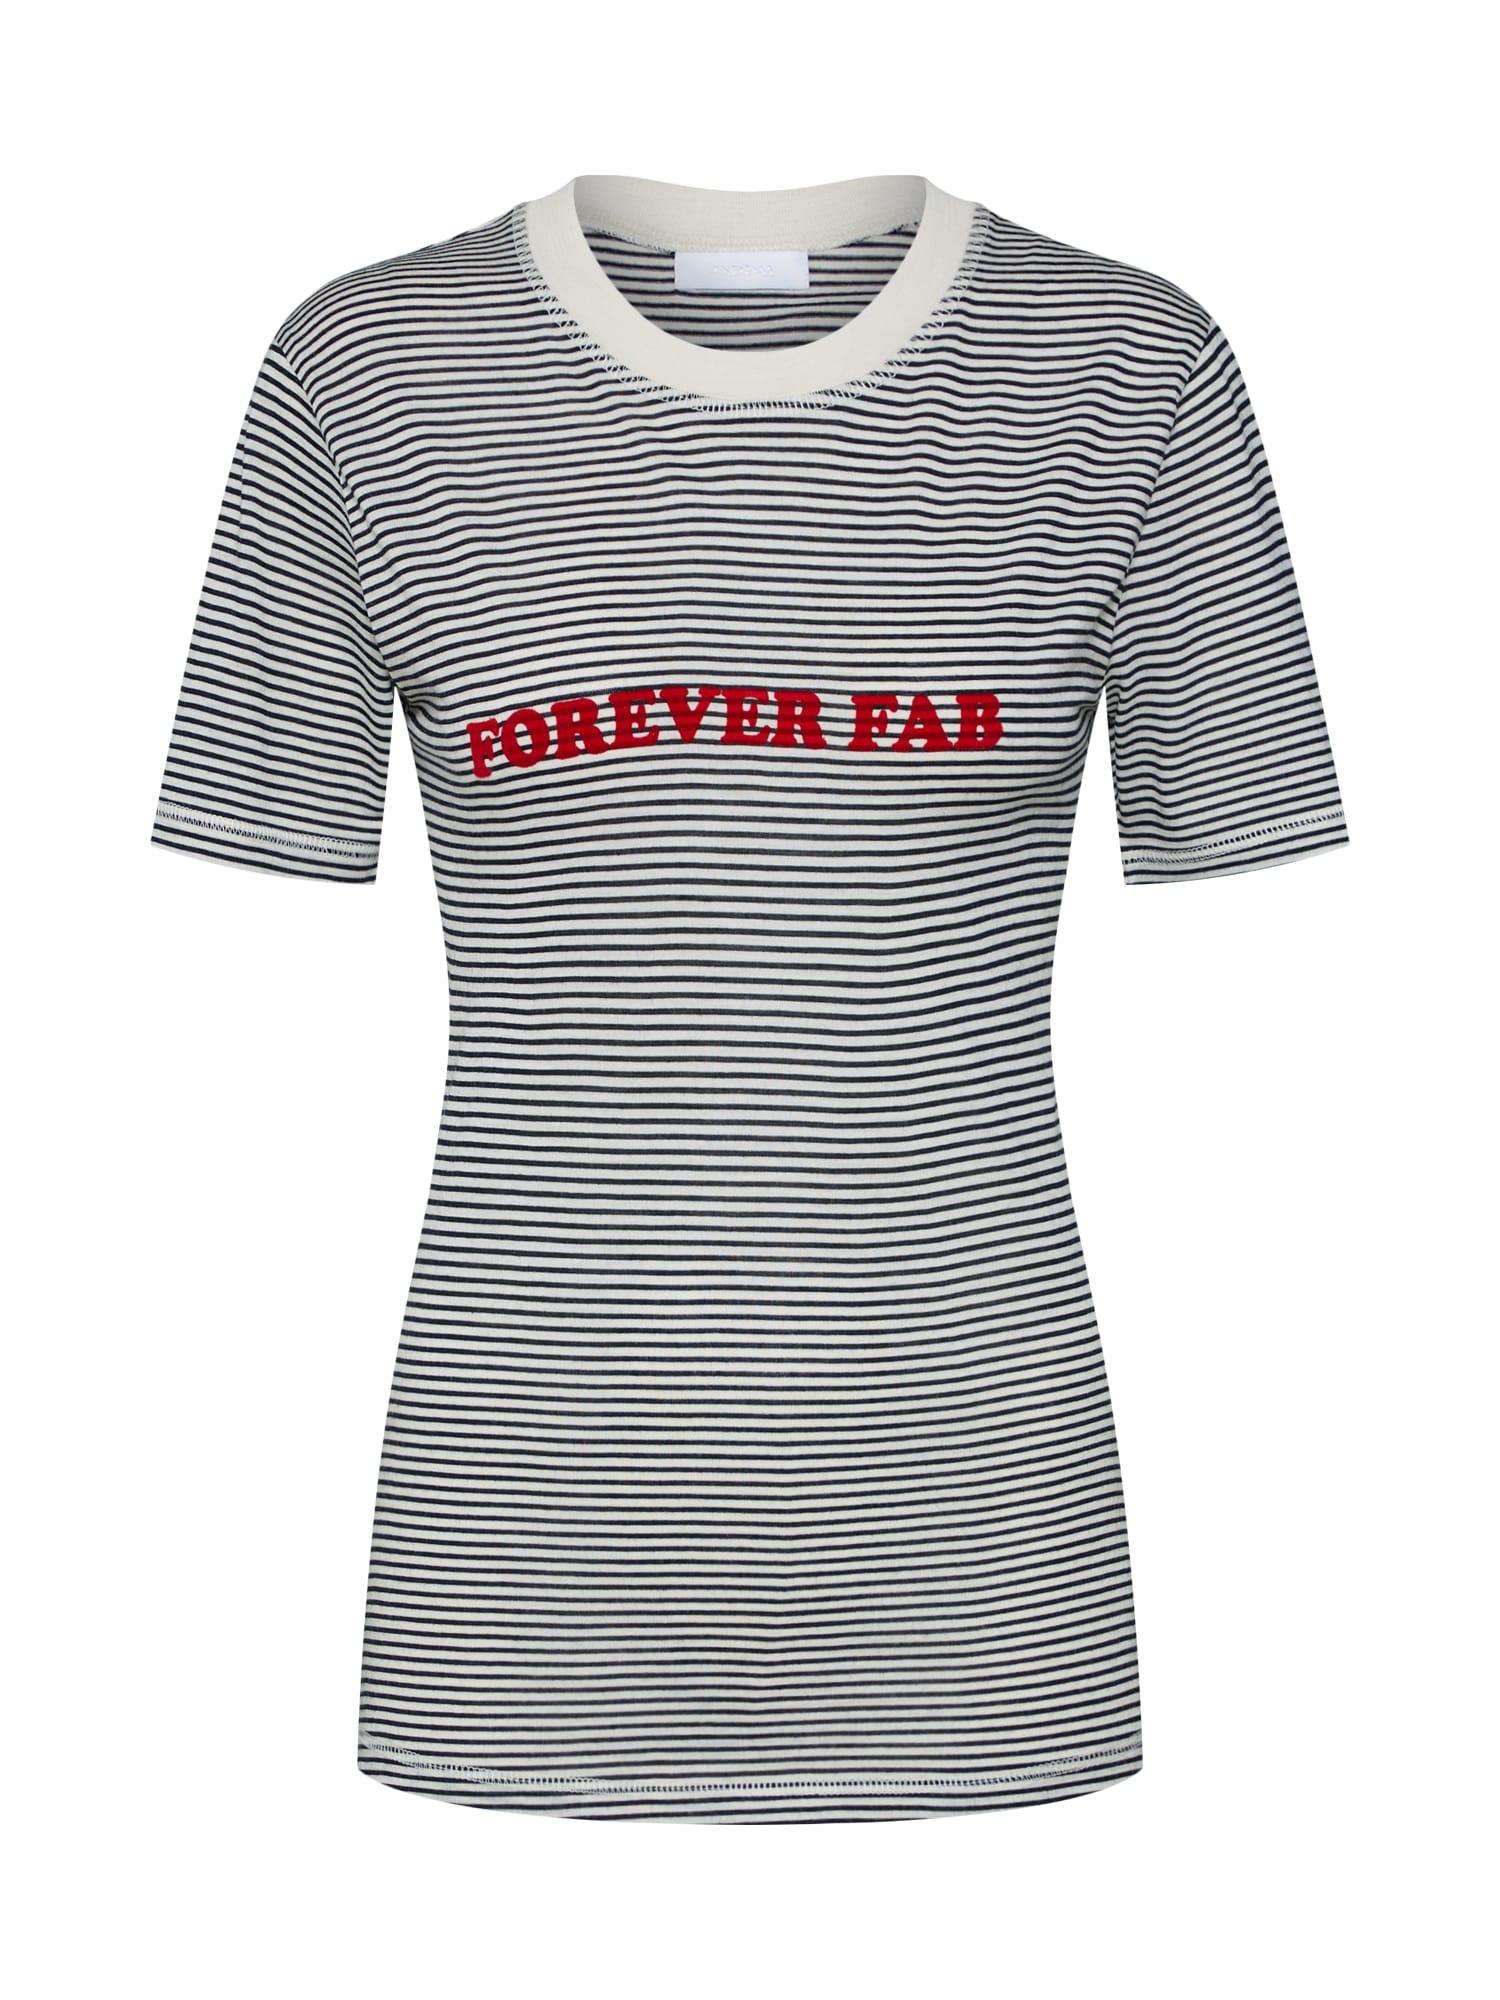 Tričko 2ND Forever Fab černá bílá 2ND DAY